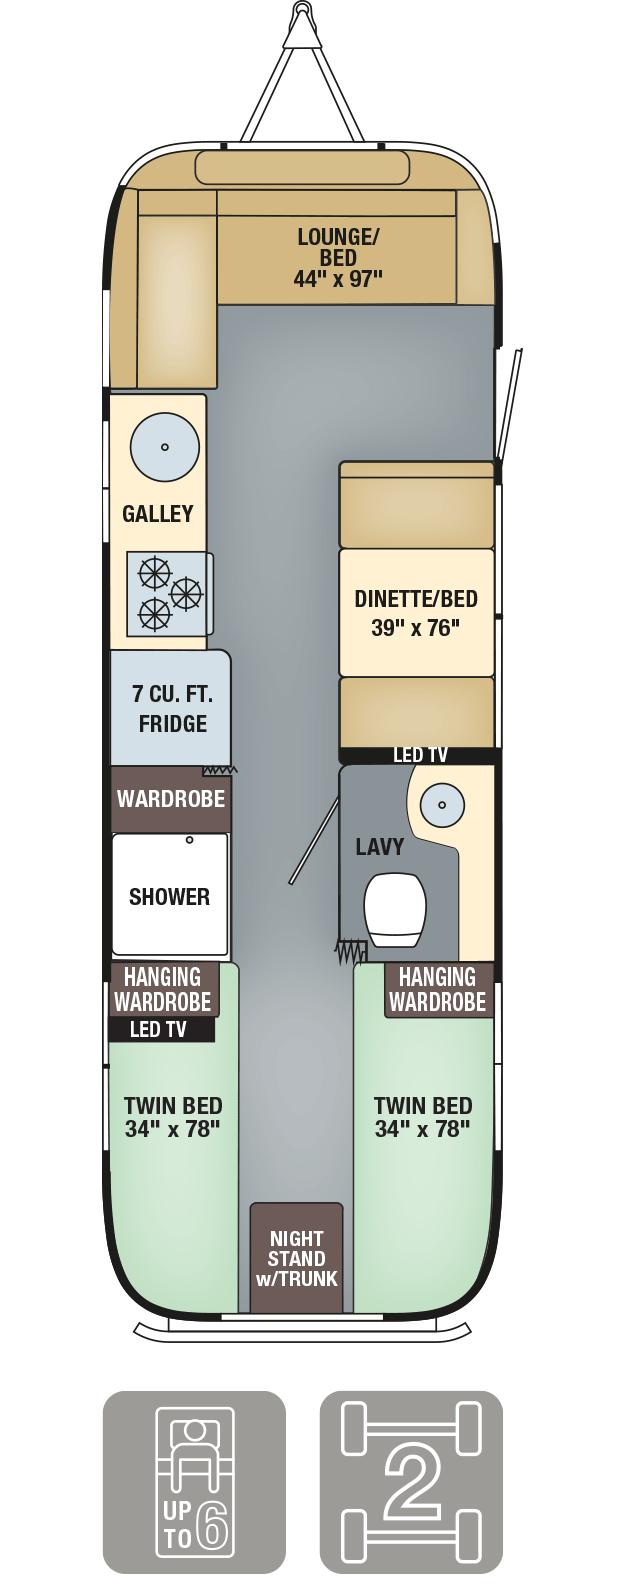 Airstream Interanational Serenity 28 Floor Plan